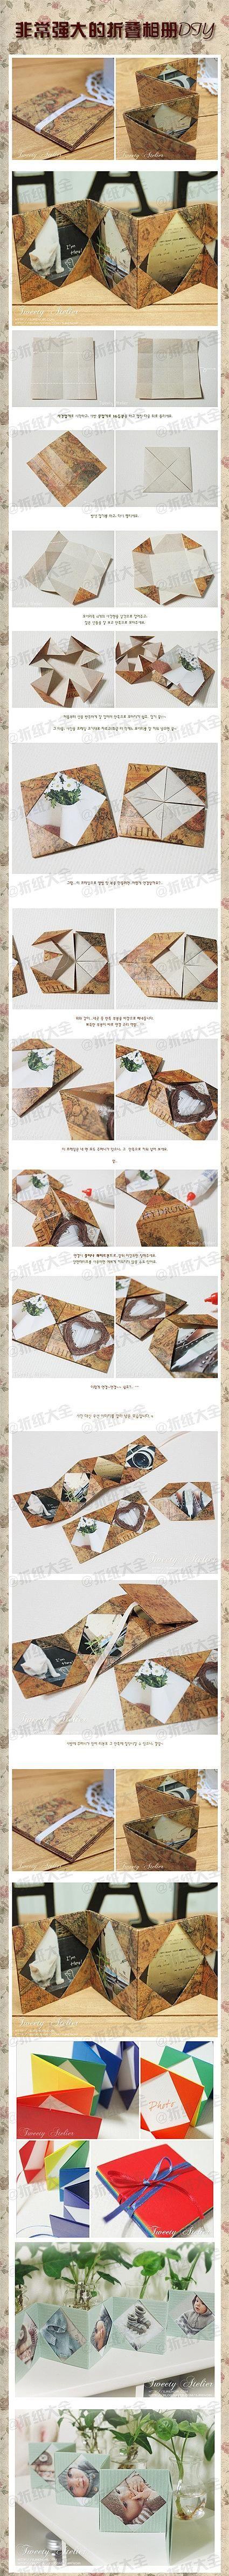 纸包相框 - DIY paper photo frame